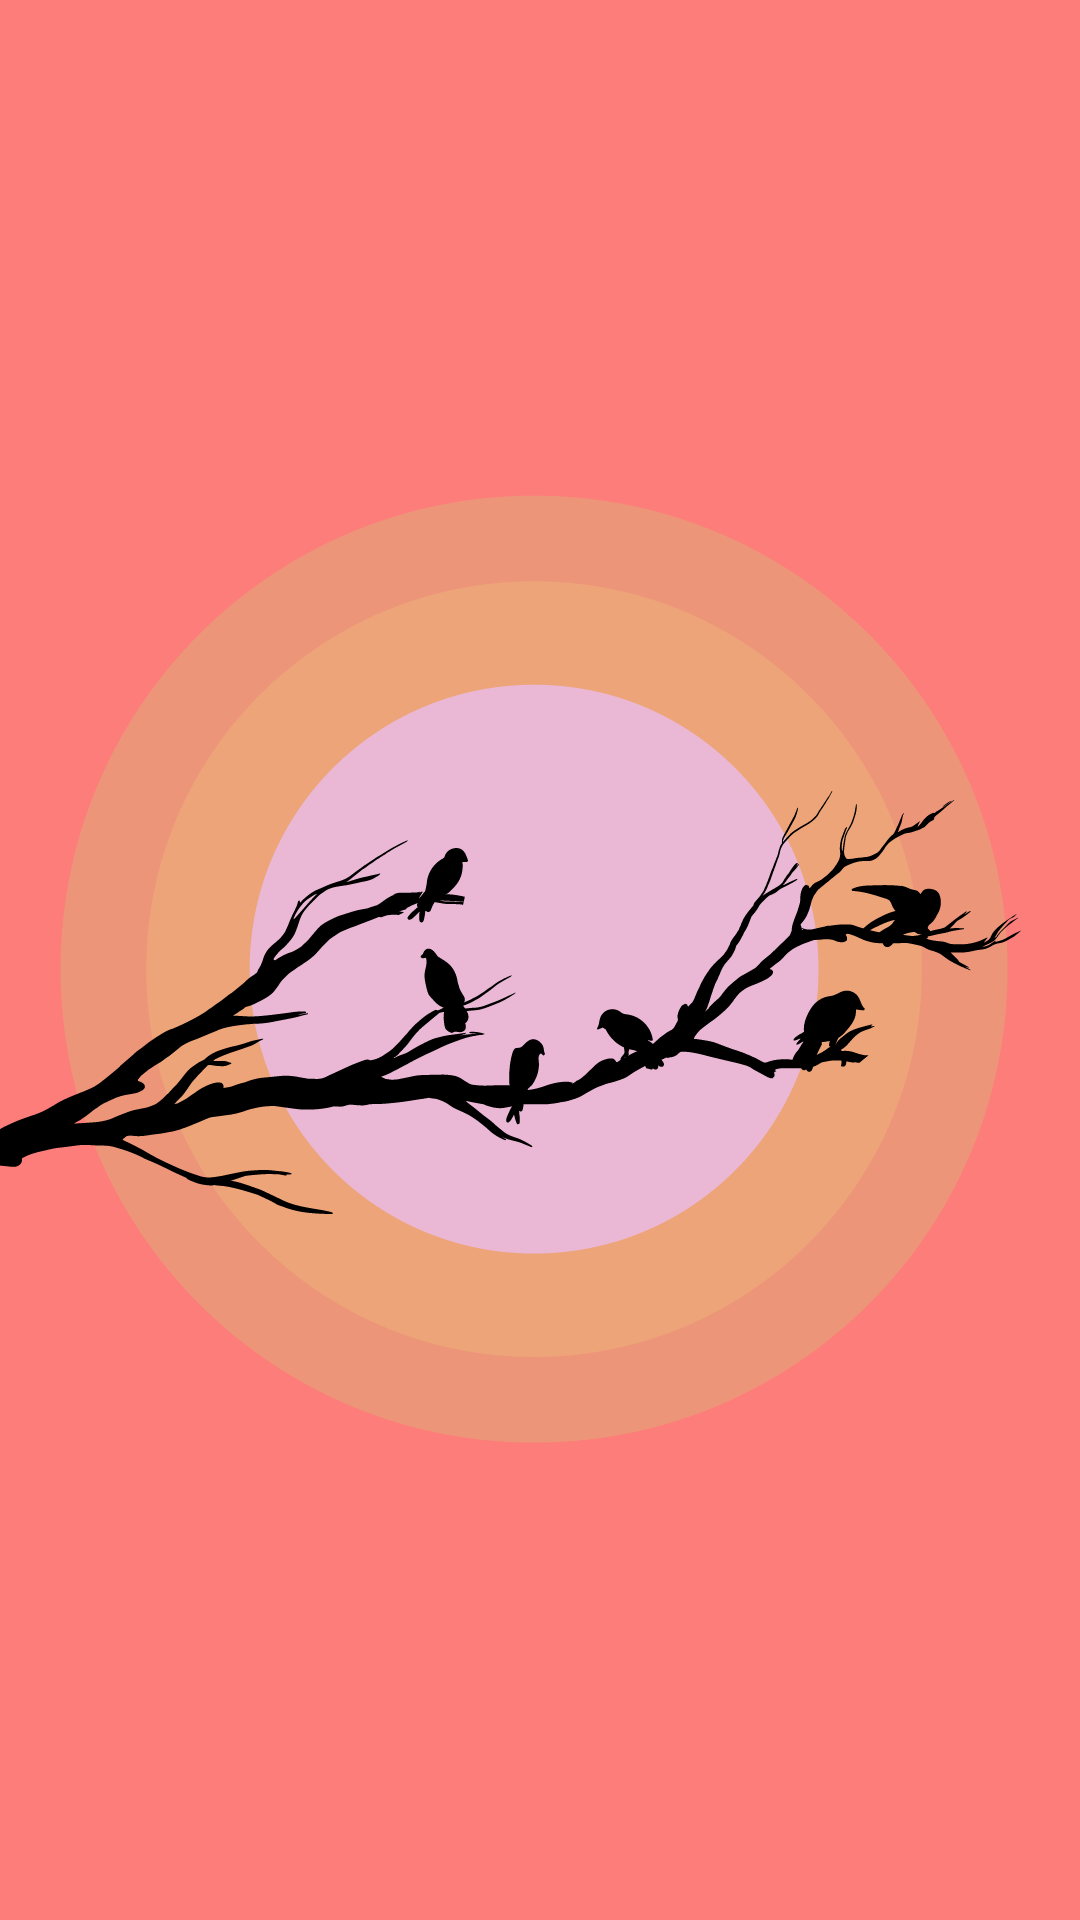 minimalistic minimalism cute birds